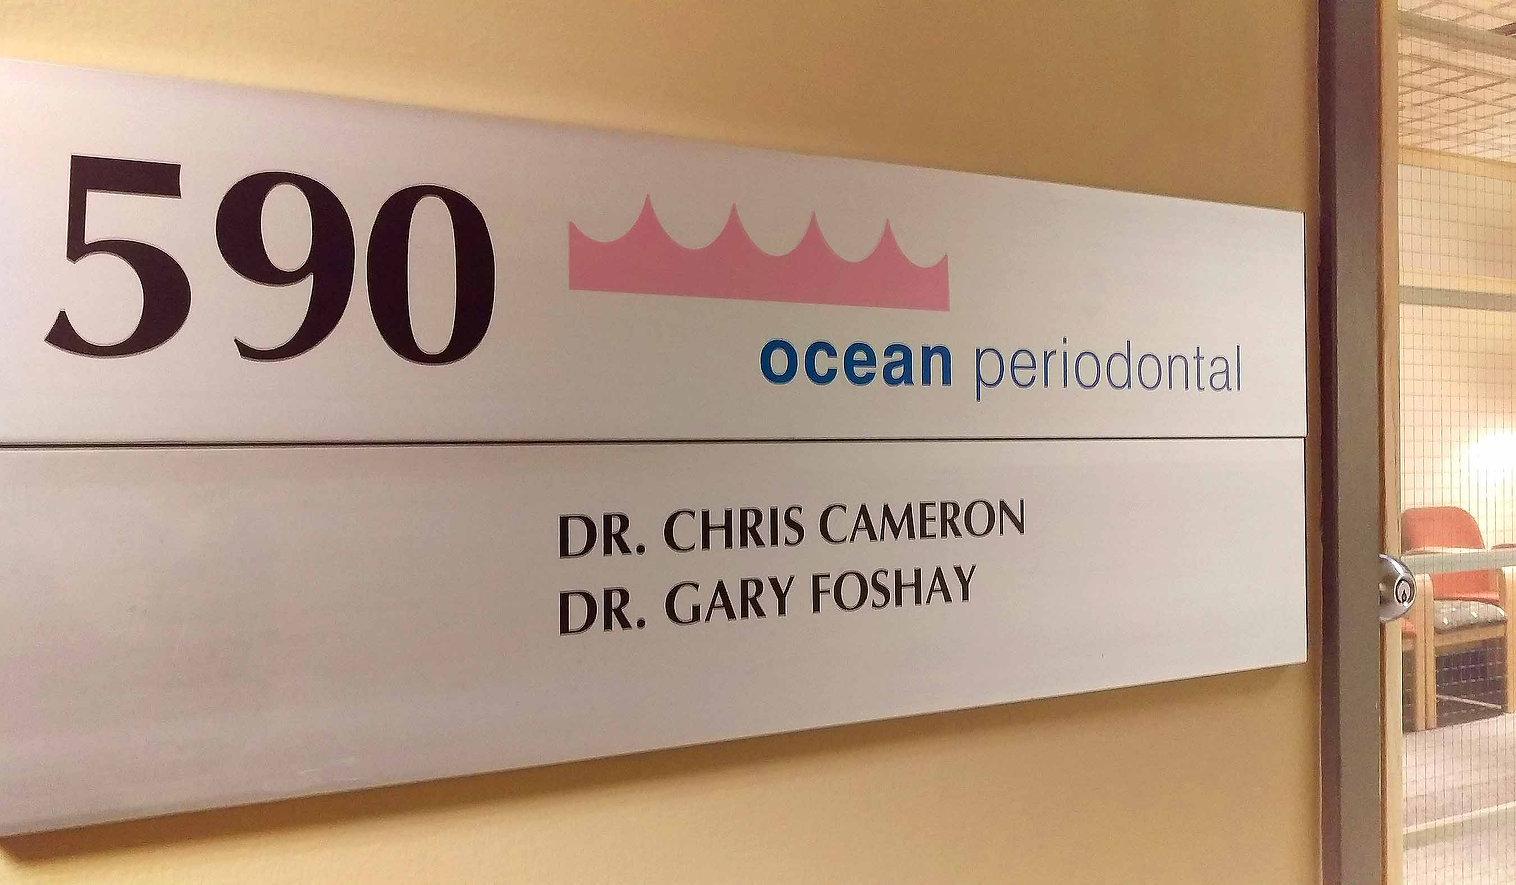 Ocean Periodontal